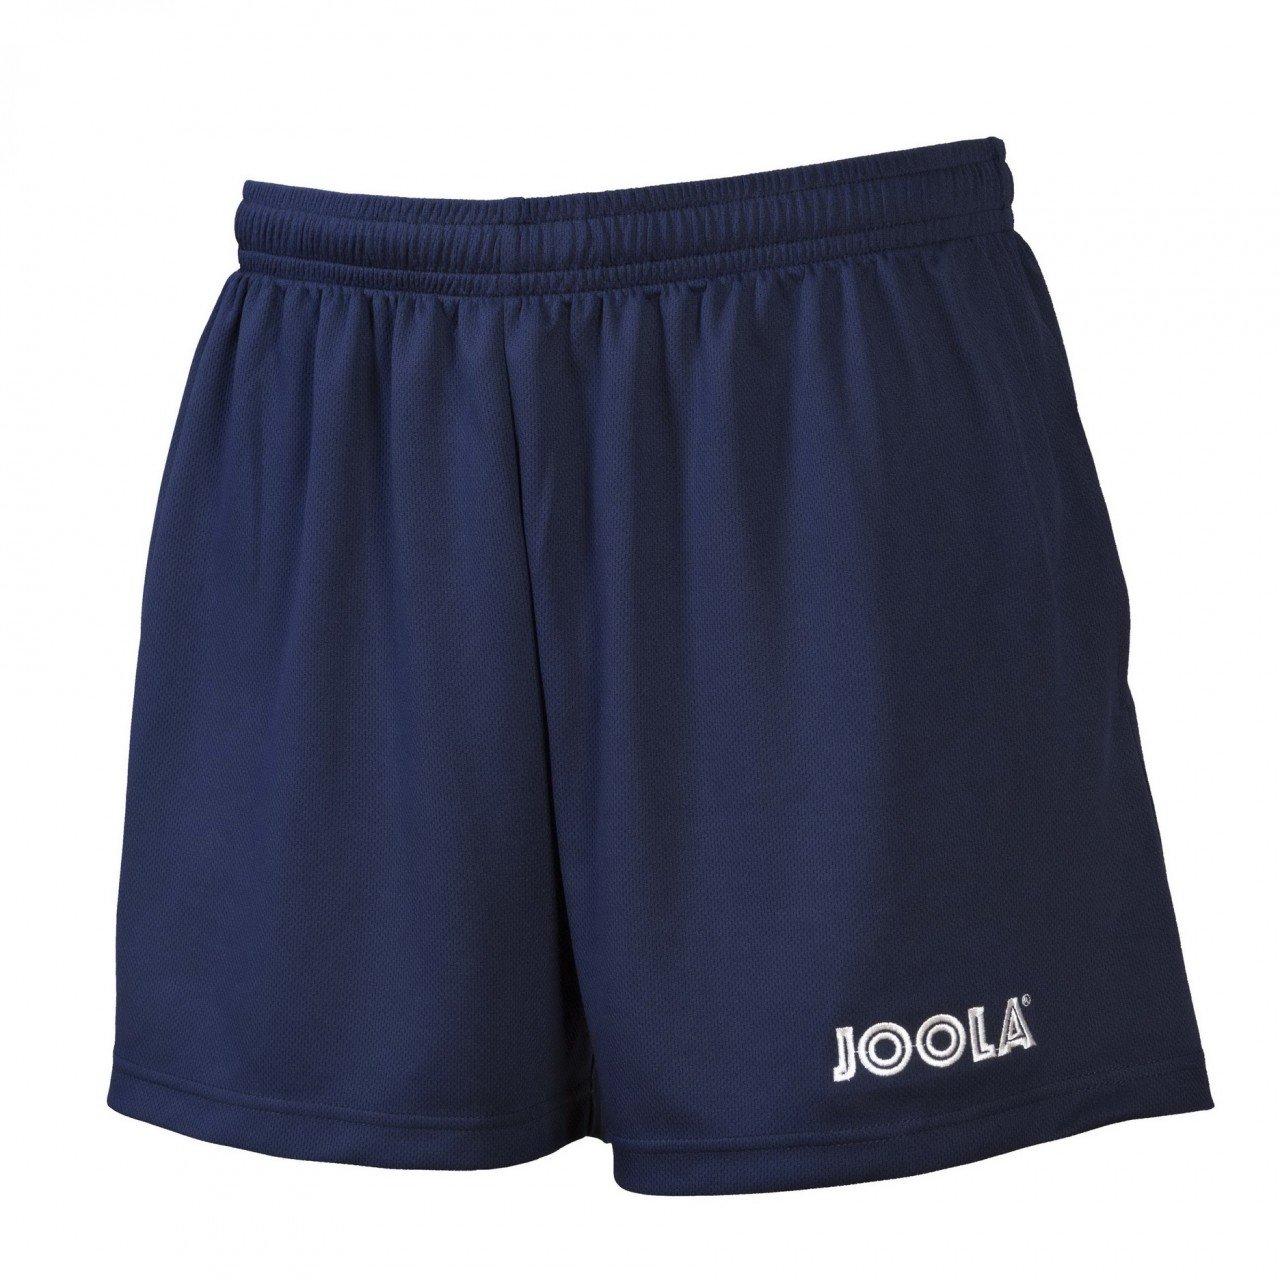 Joola SHORT BASIC NAVY M - NAVY Größe:M